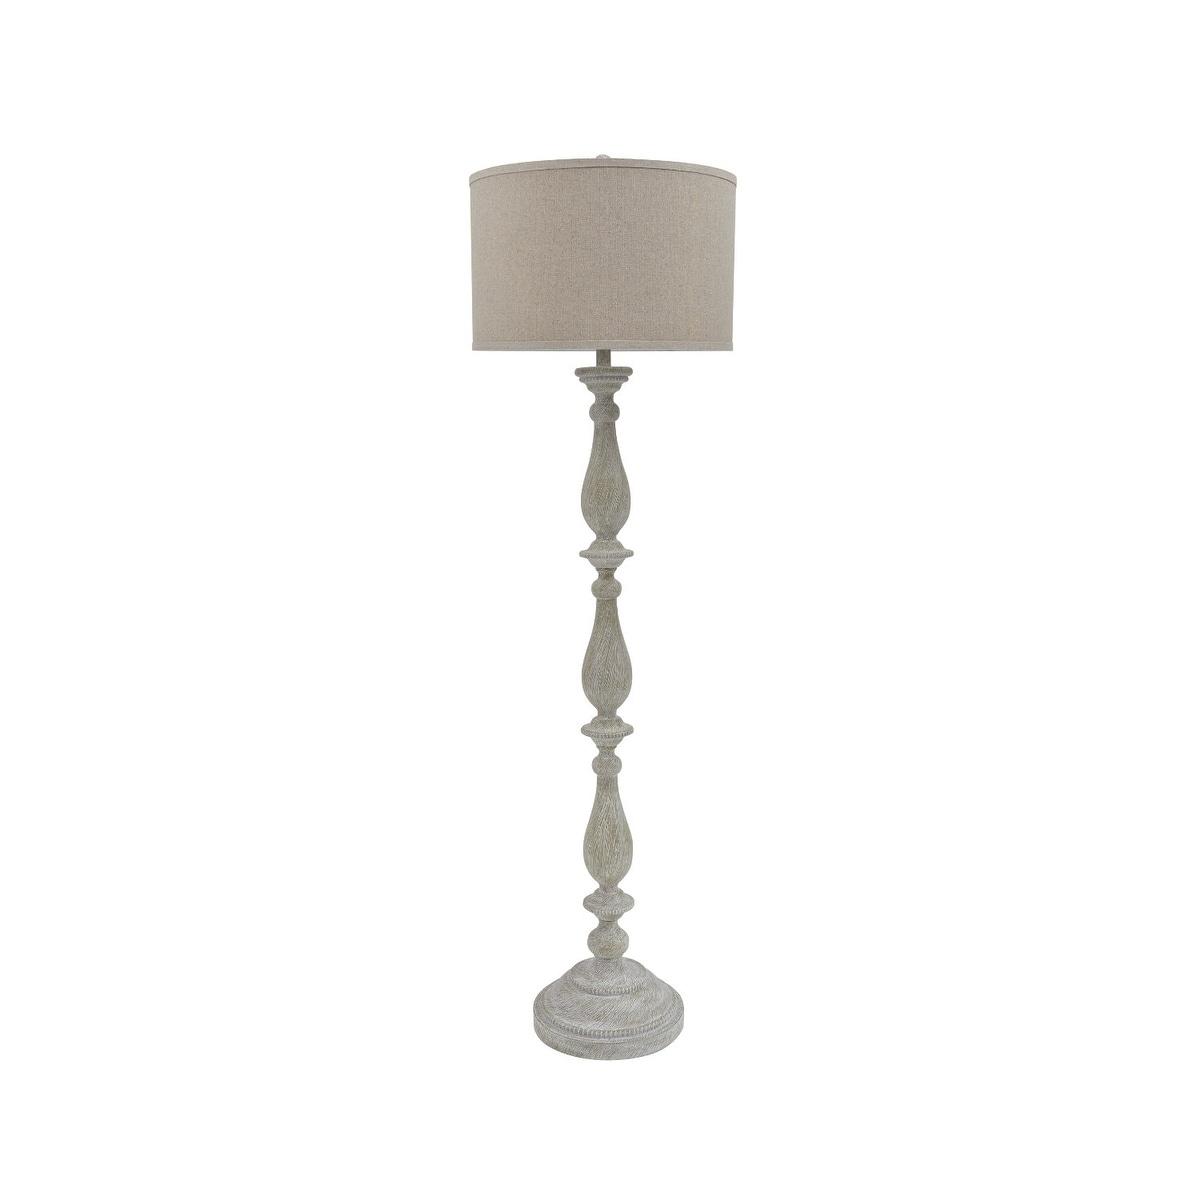 Bernadate Whitewash 62 Inch Floor Lamp On Sale Overstock 21011315